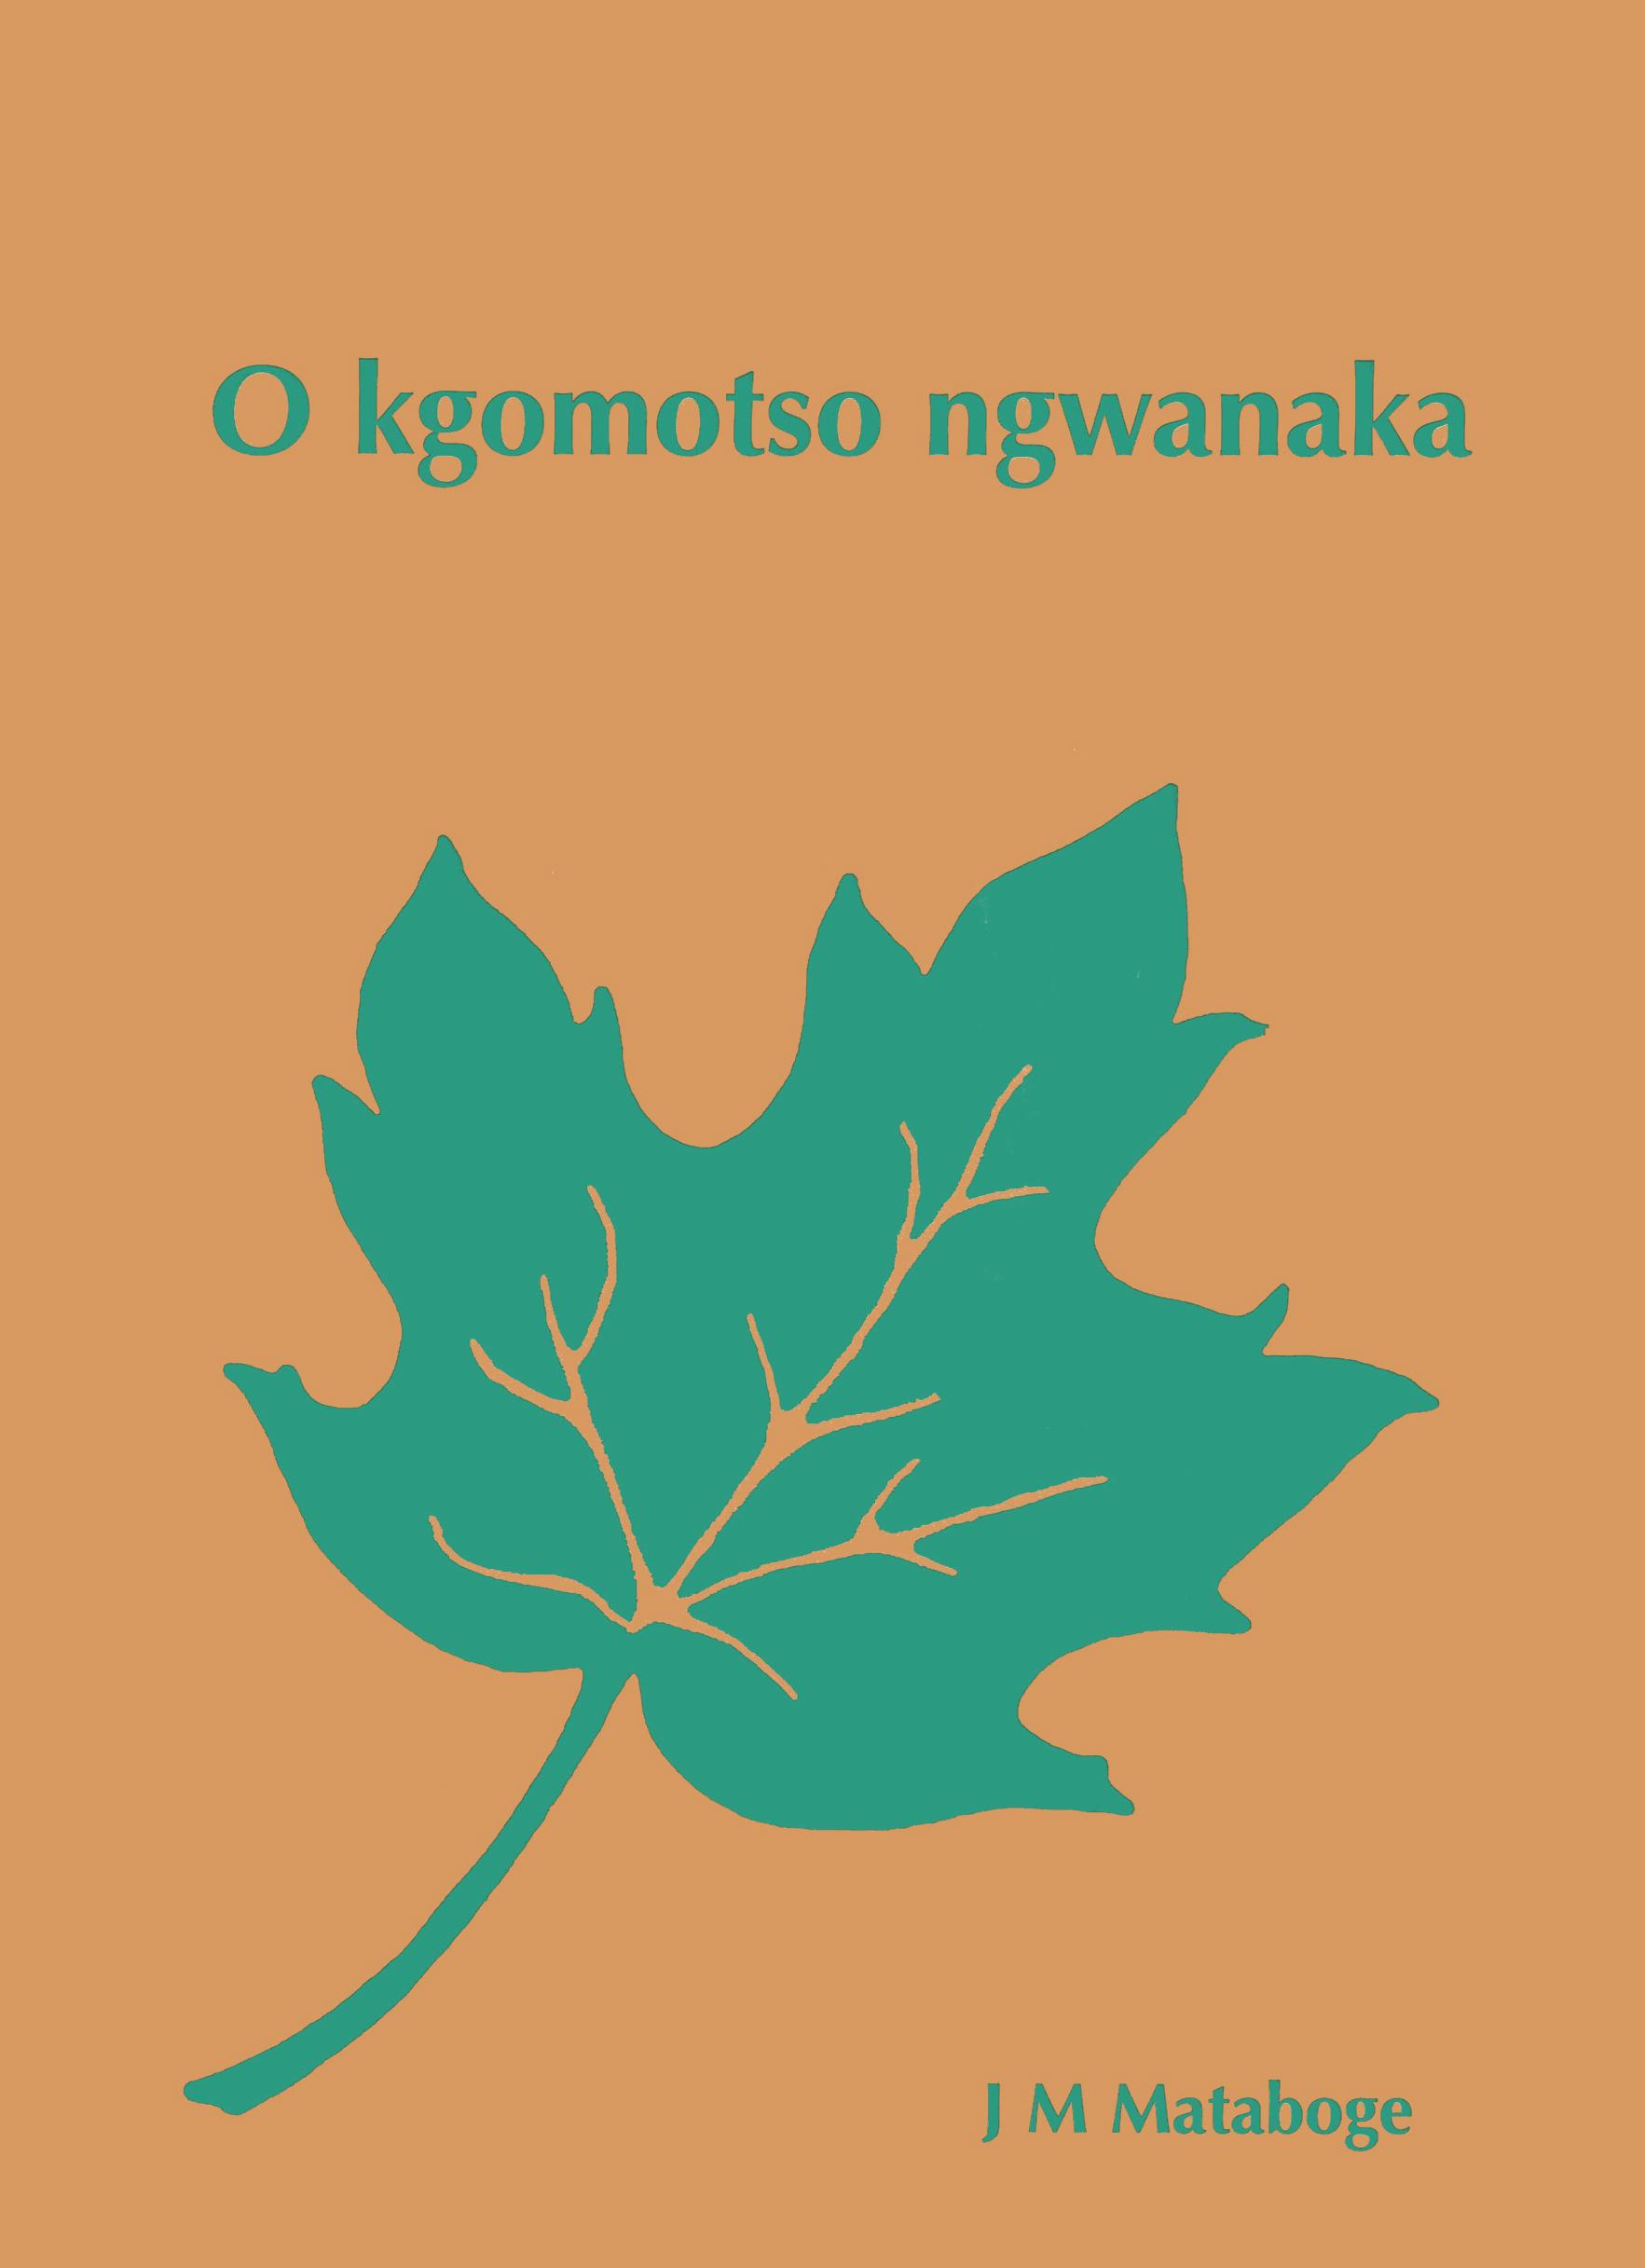 Picture of O kgomotso ngwanaka